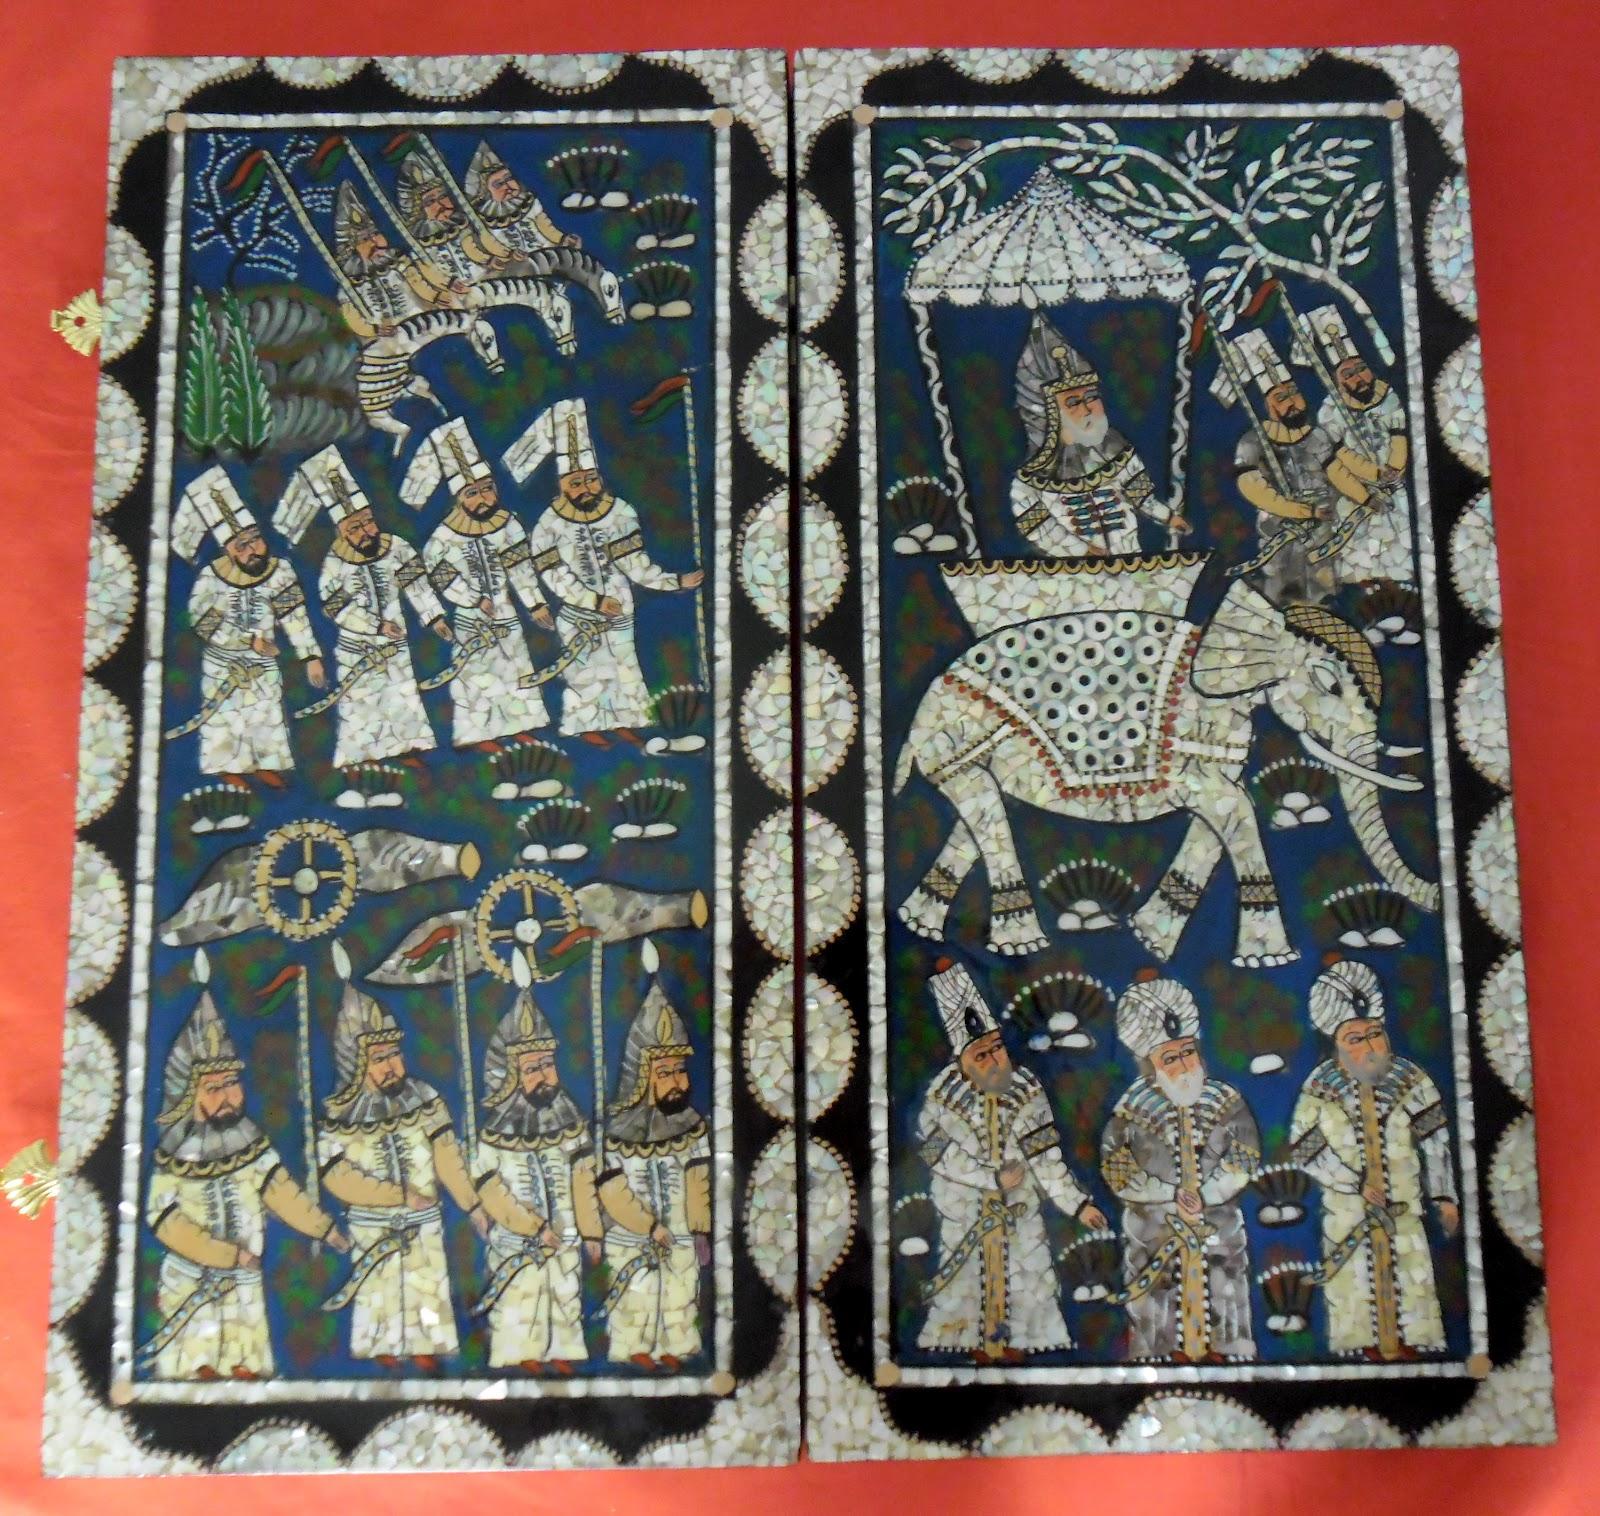 minyatur sanatcisi osmanli el sanatlari 2012 02 05